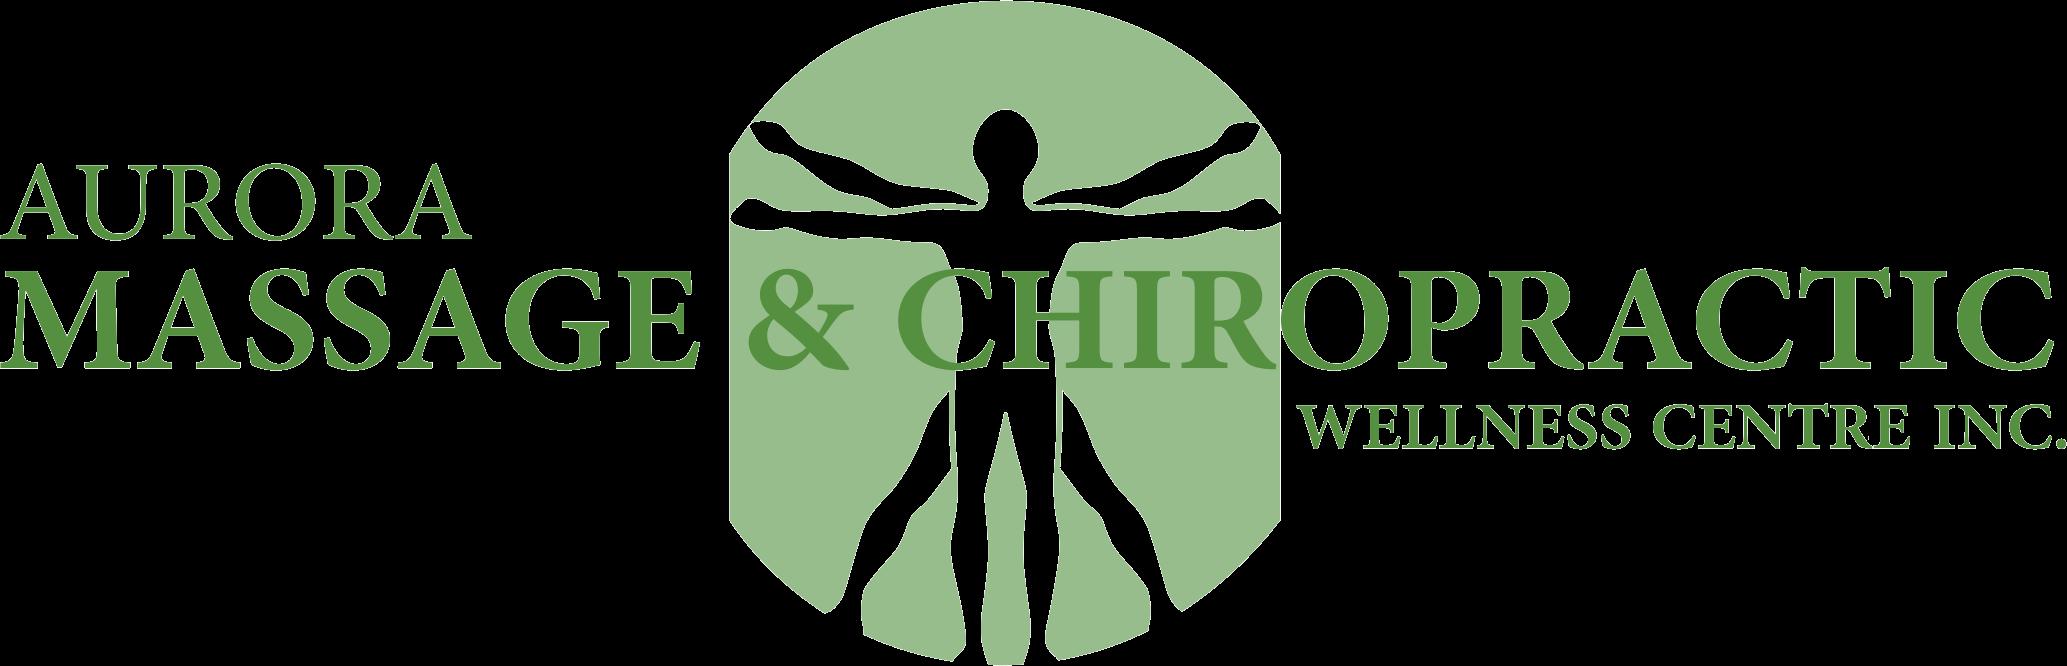 Aurora Massage and Chiropractic Wellness Centre Inc.